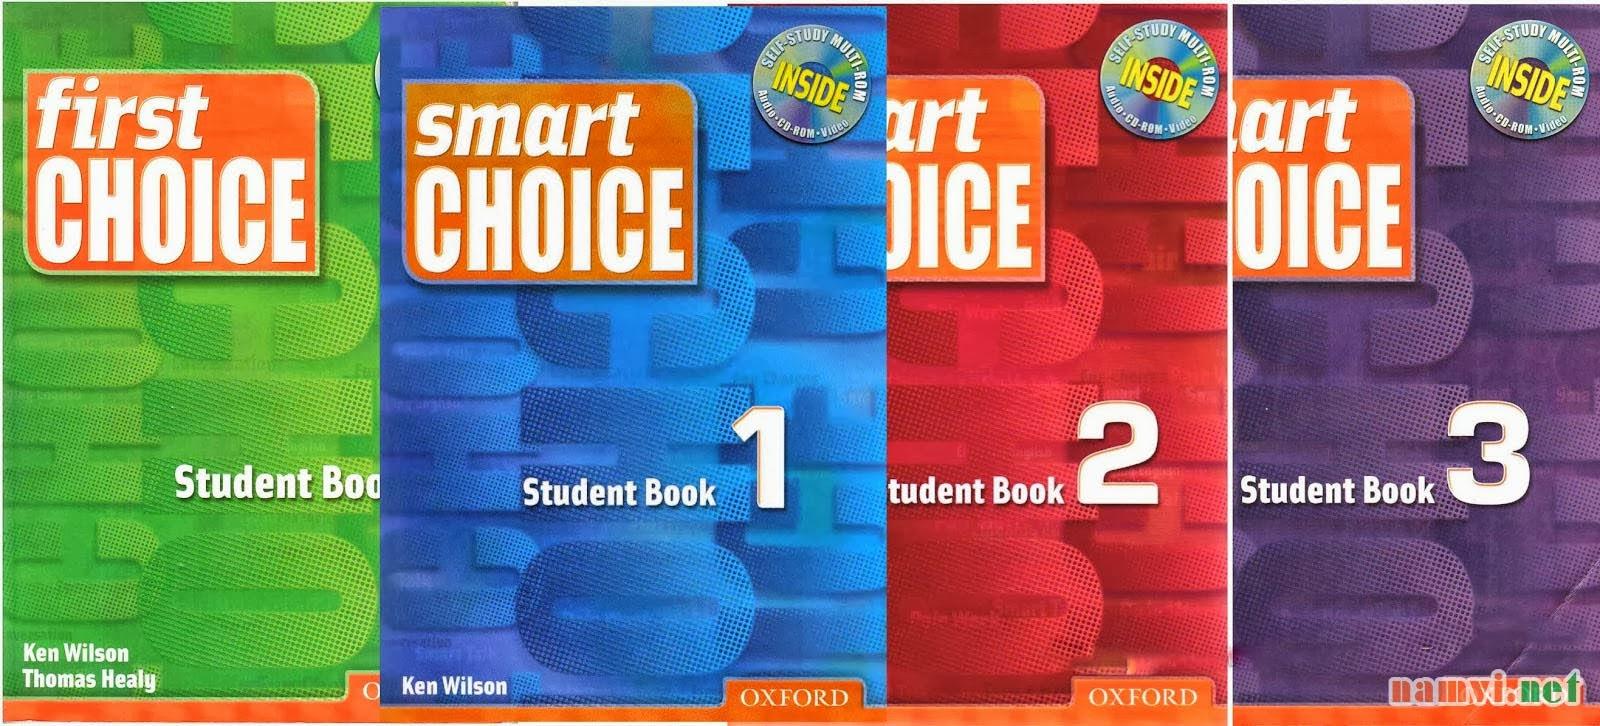 http://3.bp.blogspot.com/-Ek0tGW6kEvc/Uvs_cAKFpgI/AAAAAAAABMw/34kpFuib1Aw/s1600/bo_giao_trinh_First_Choice_Smart_Choic.jpg